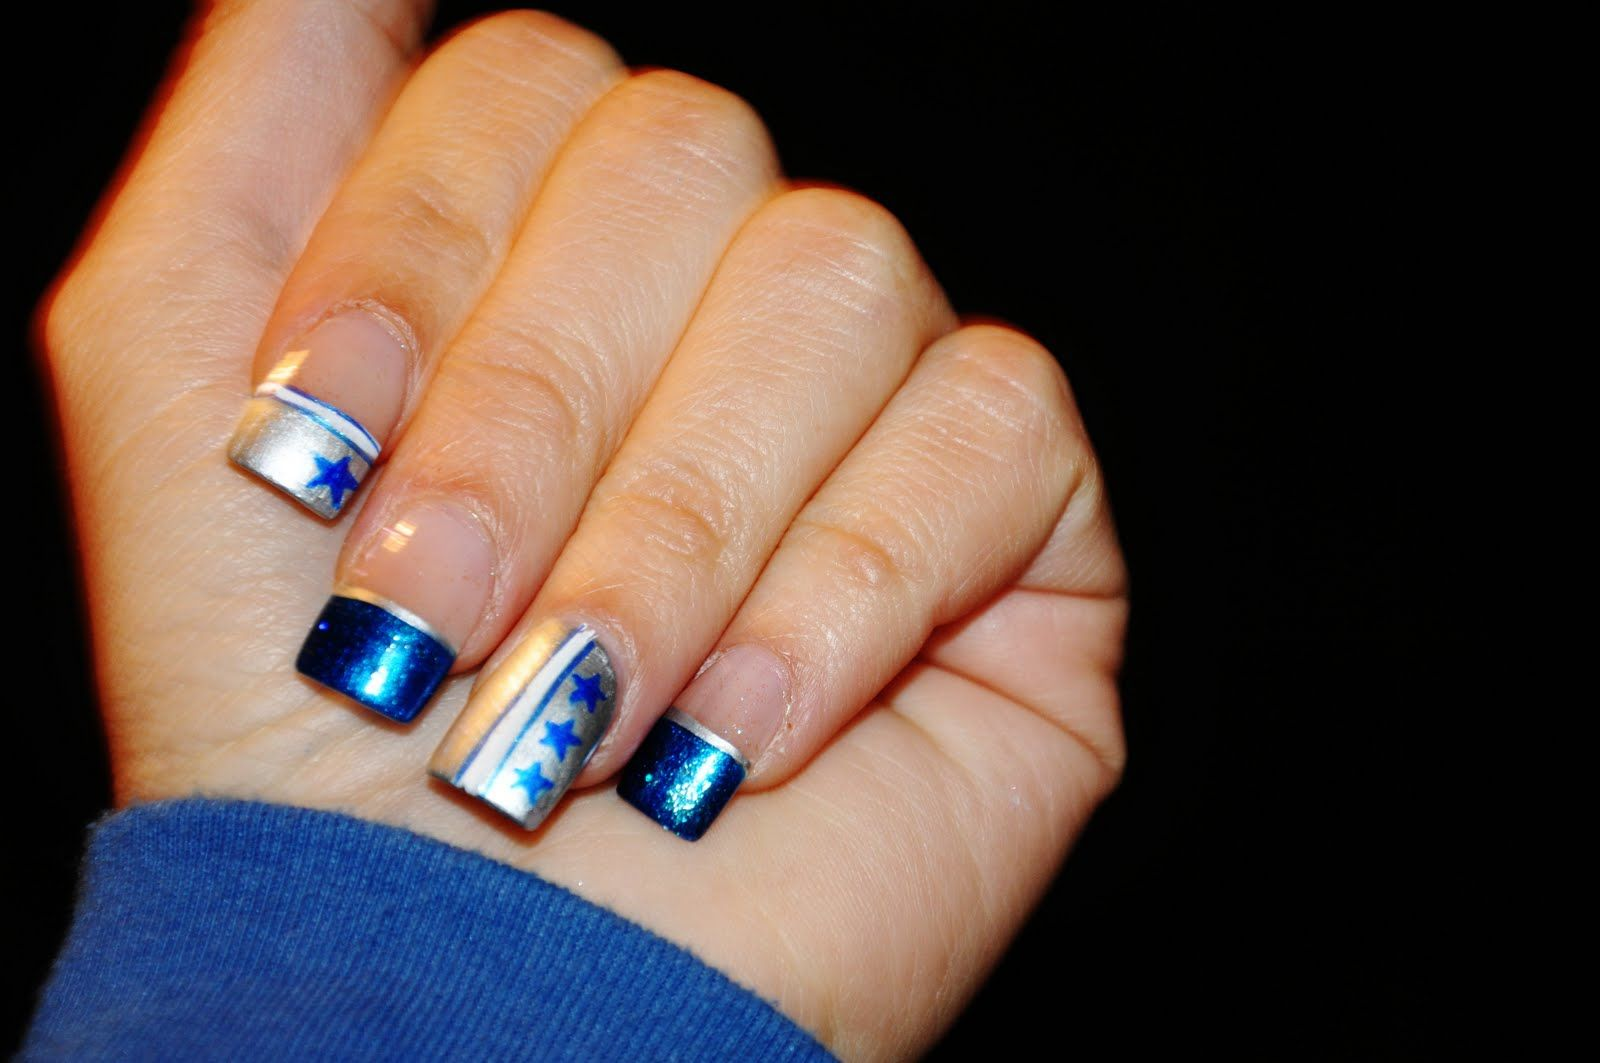 Nail Art Ideas » Dallas Nail Art - Pictures of Nail Art Design Ideas